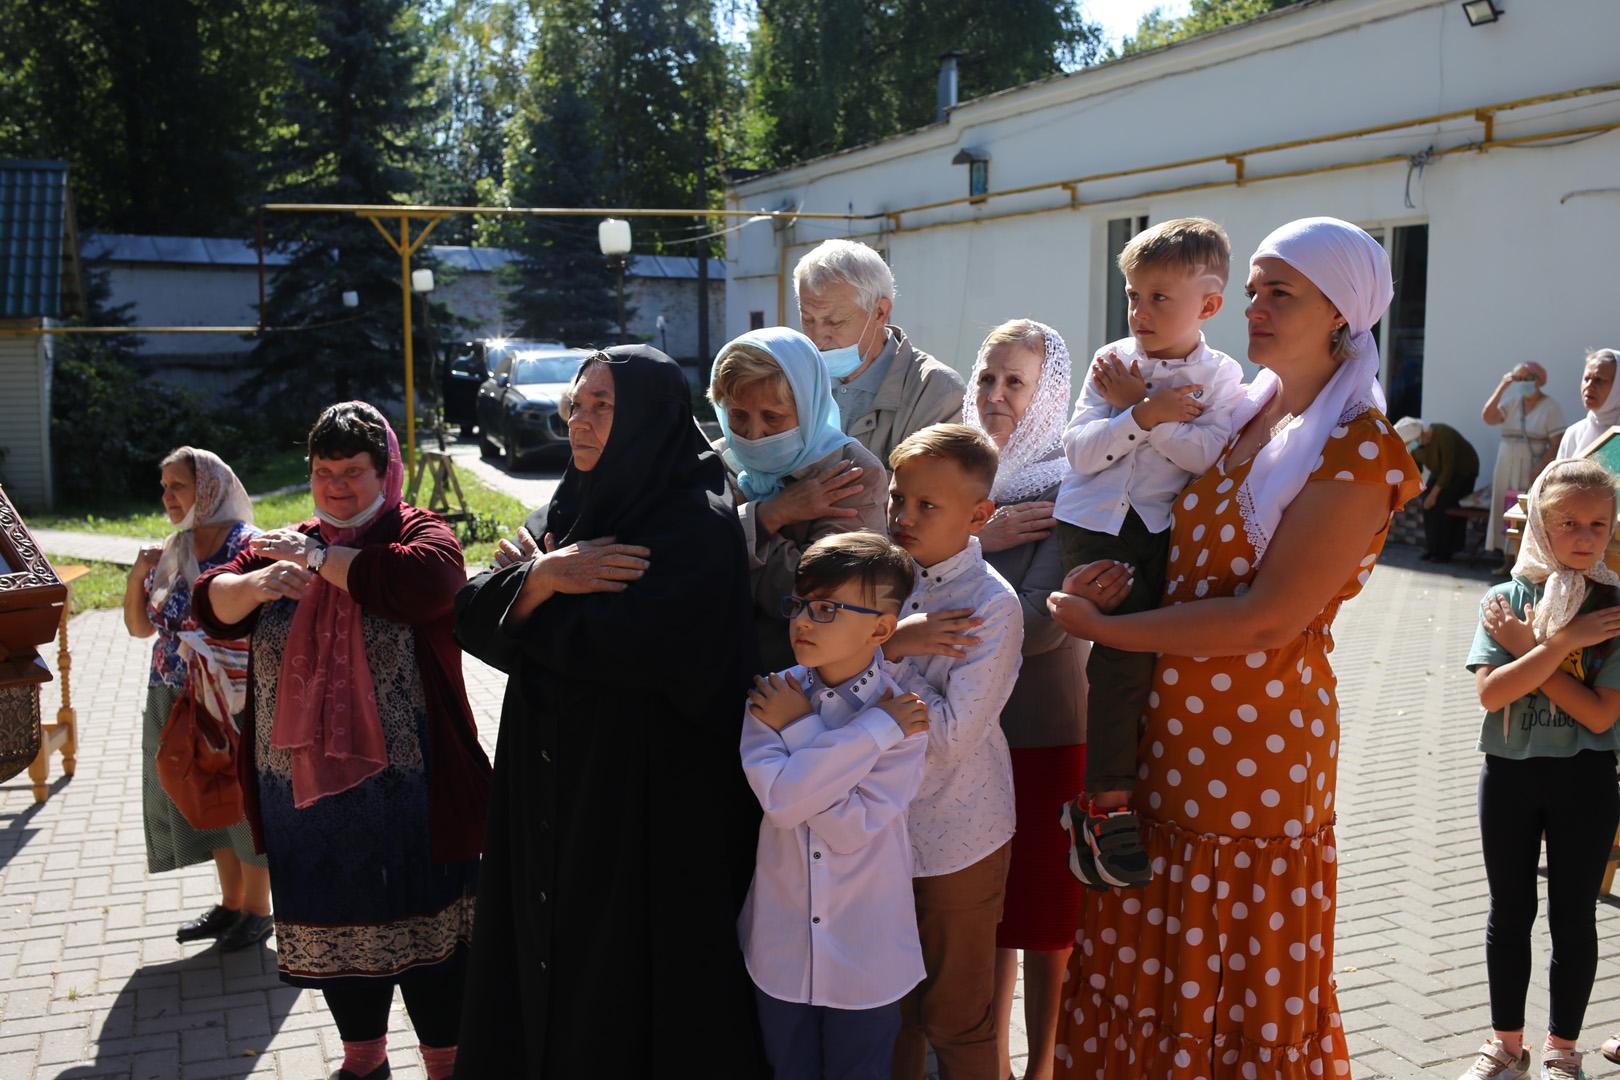 http://monuspen.ru/photoreports/b0408ef58ce532de63b0121cd6c6b60t.jpg